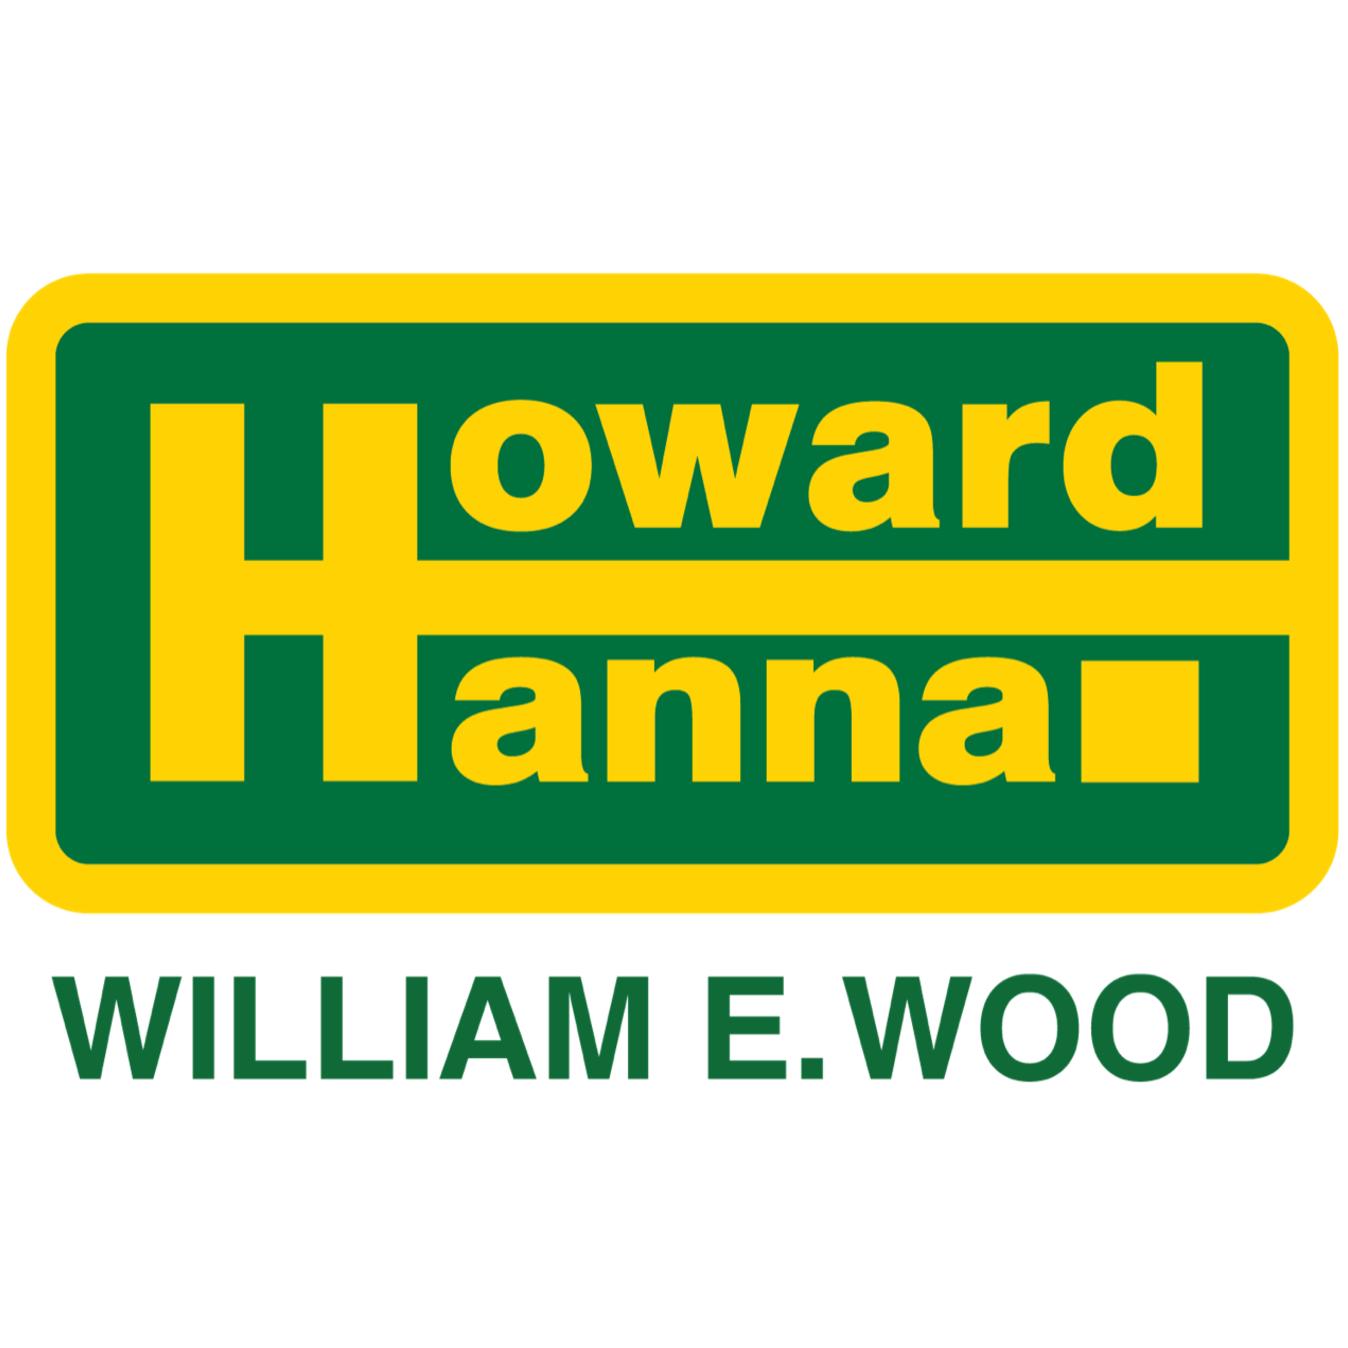 Mike Narlis - Howard Hanna - William E. Wood Realtors